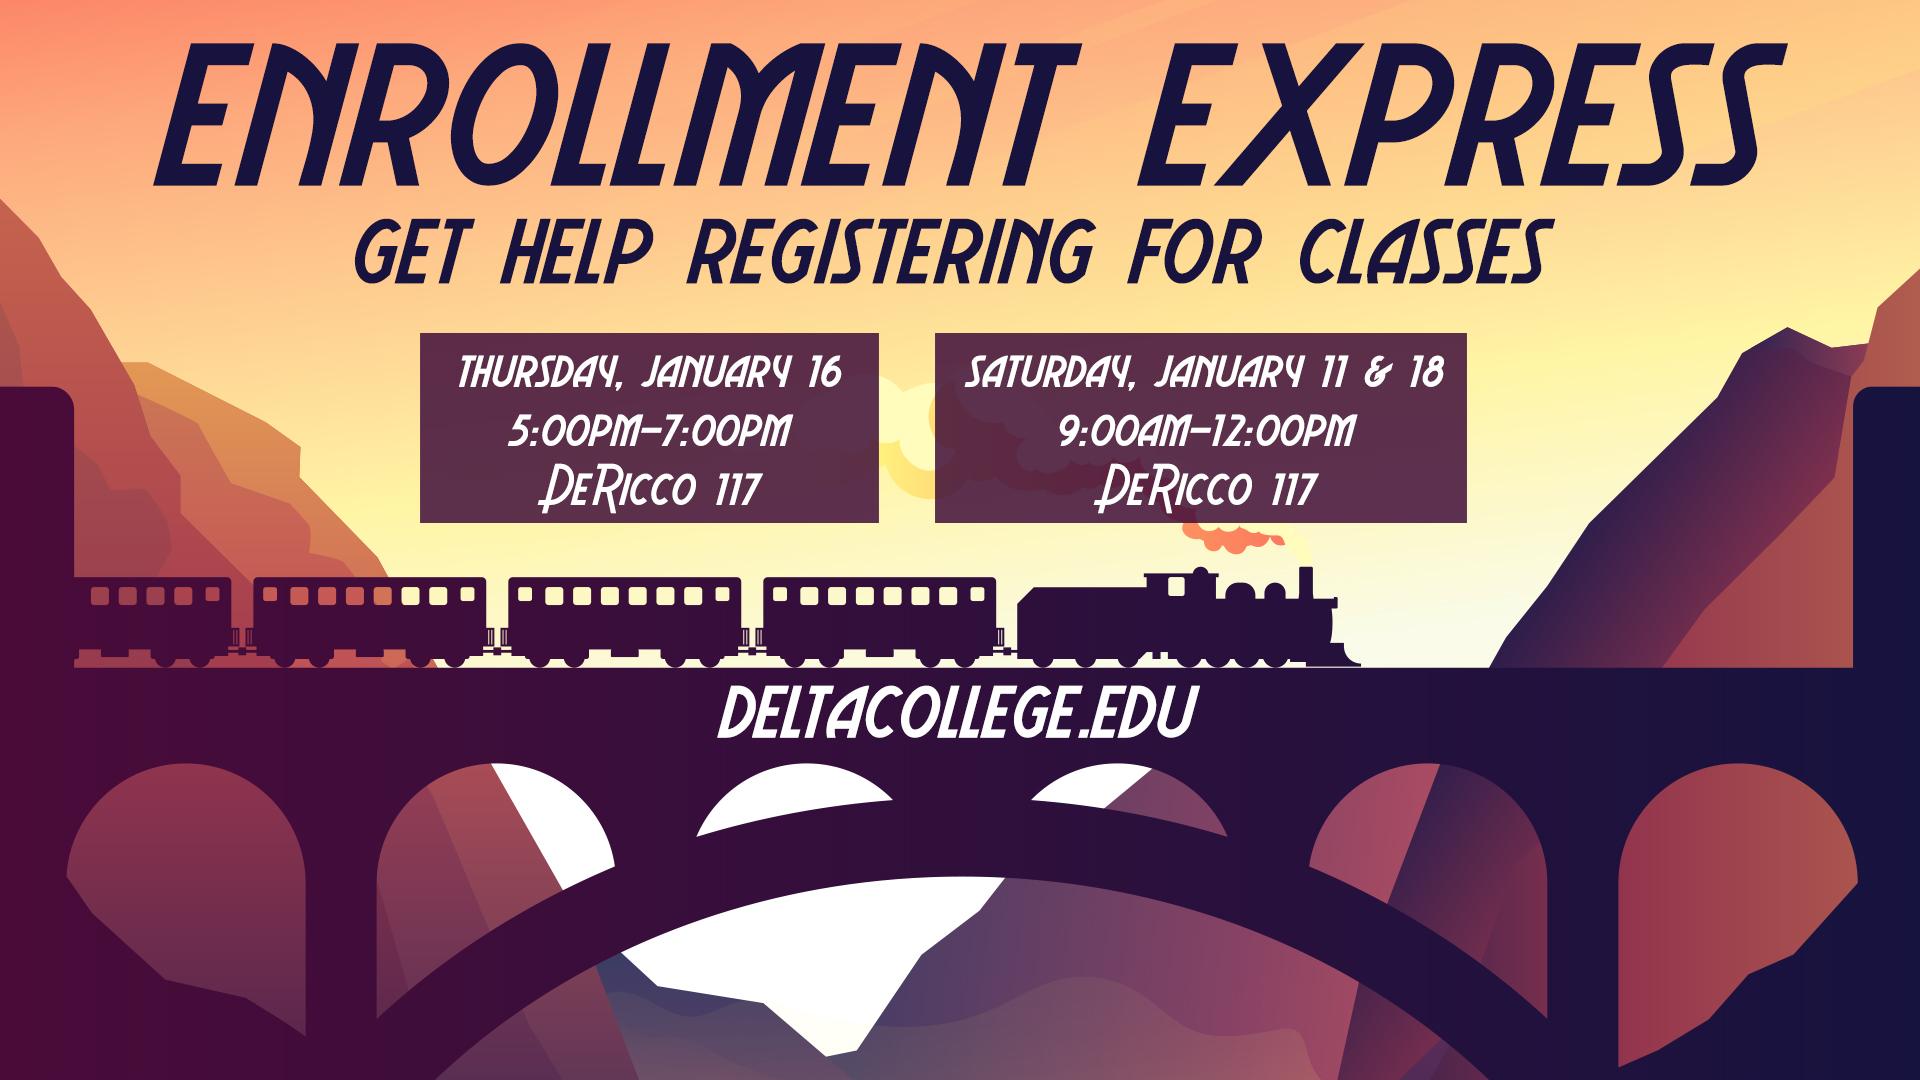 Enrollment Express Train Image